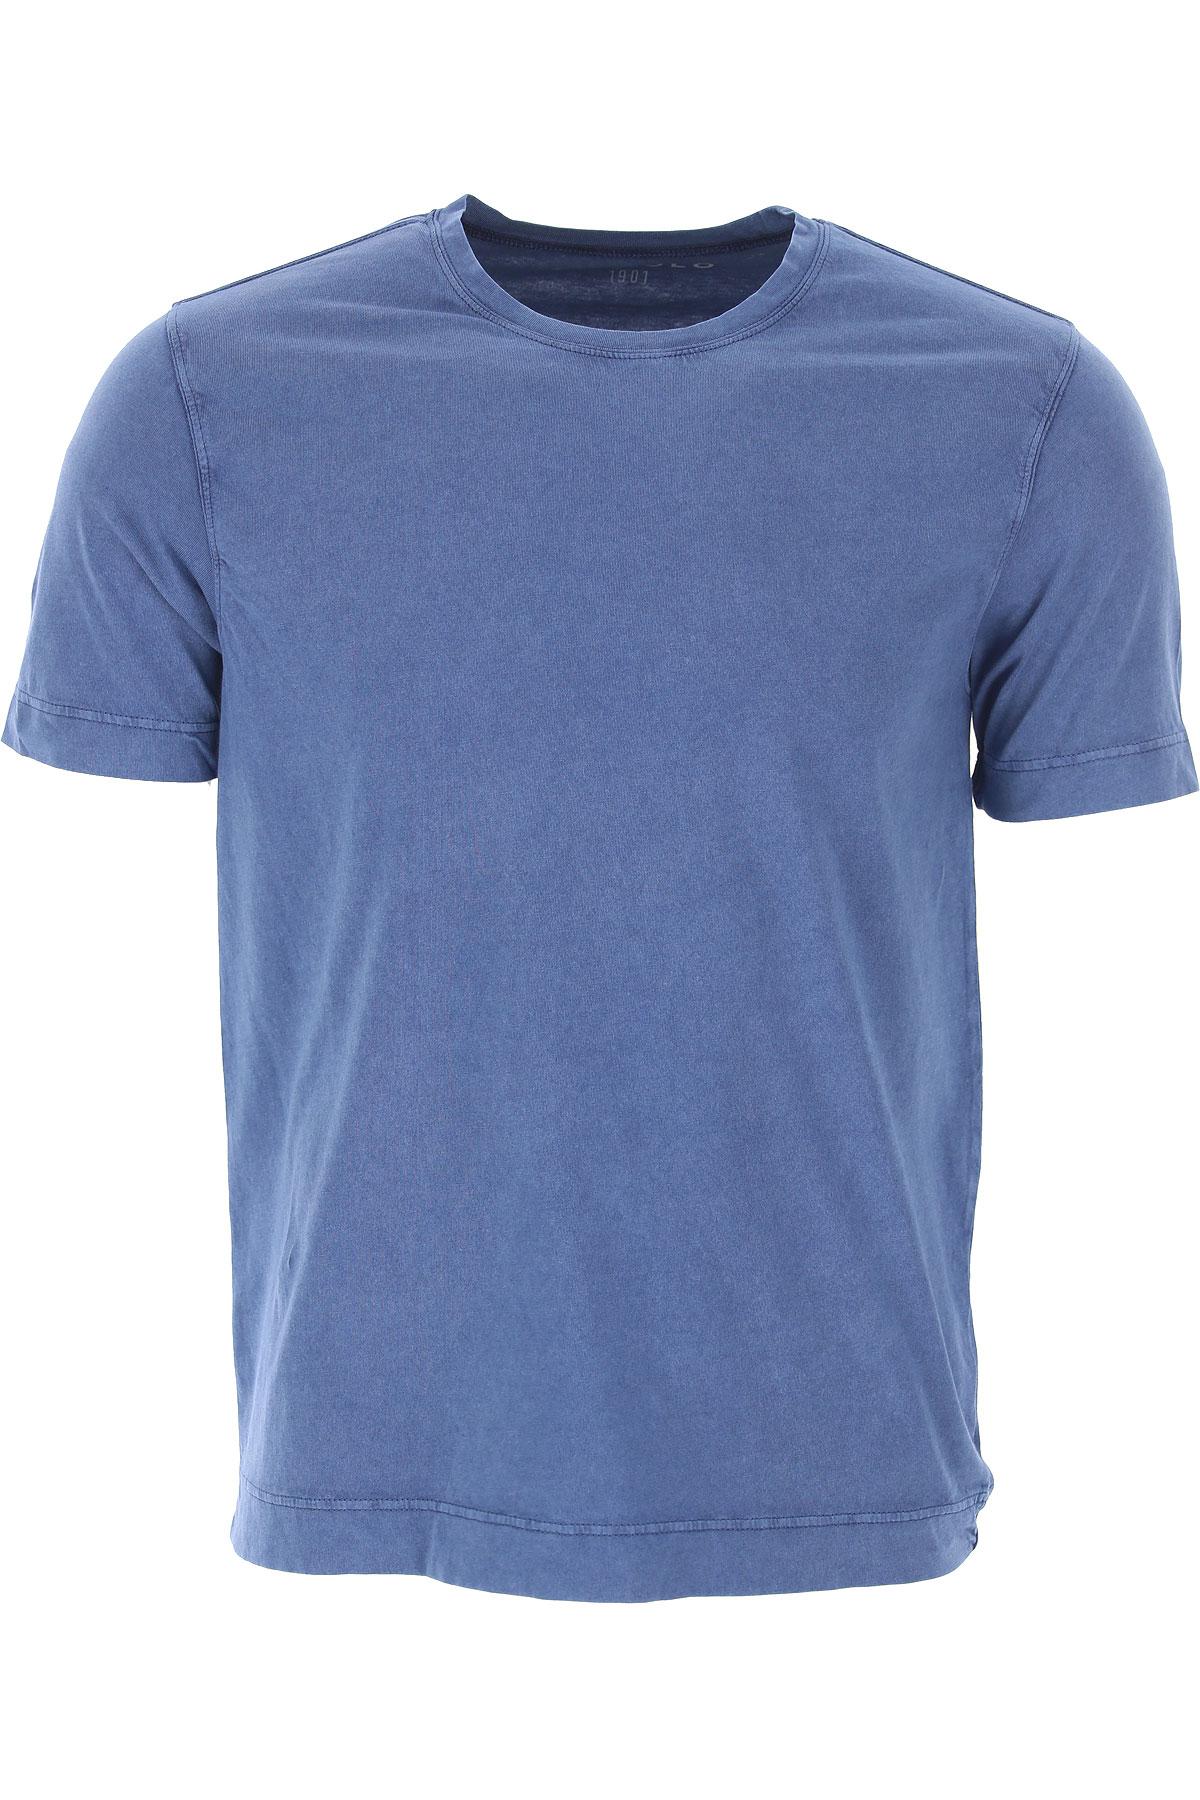 Circolo T-shirt Homme, Bleu de Jersey, Coton, 2017, M S XXL